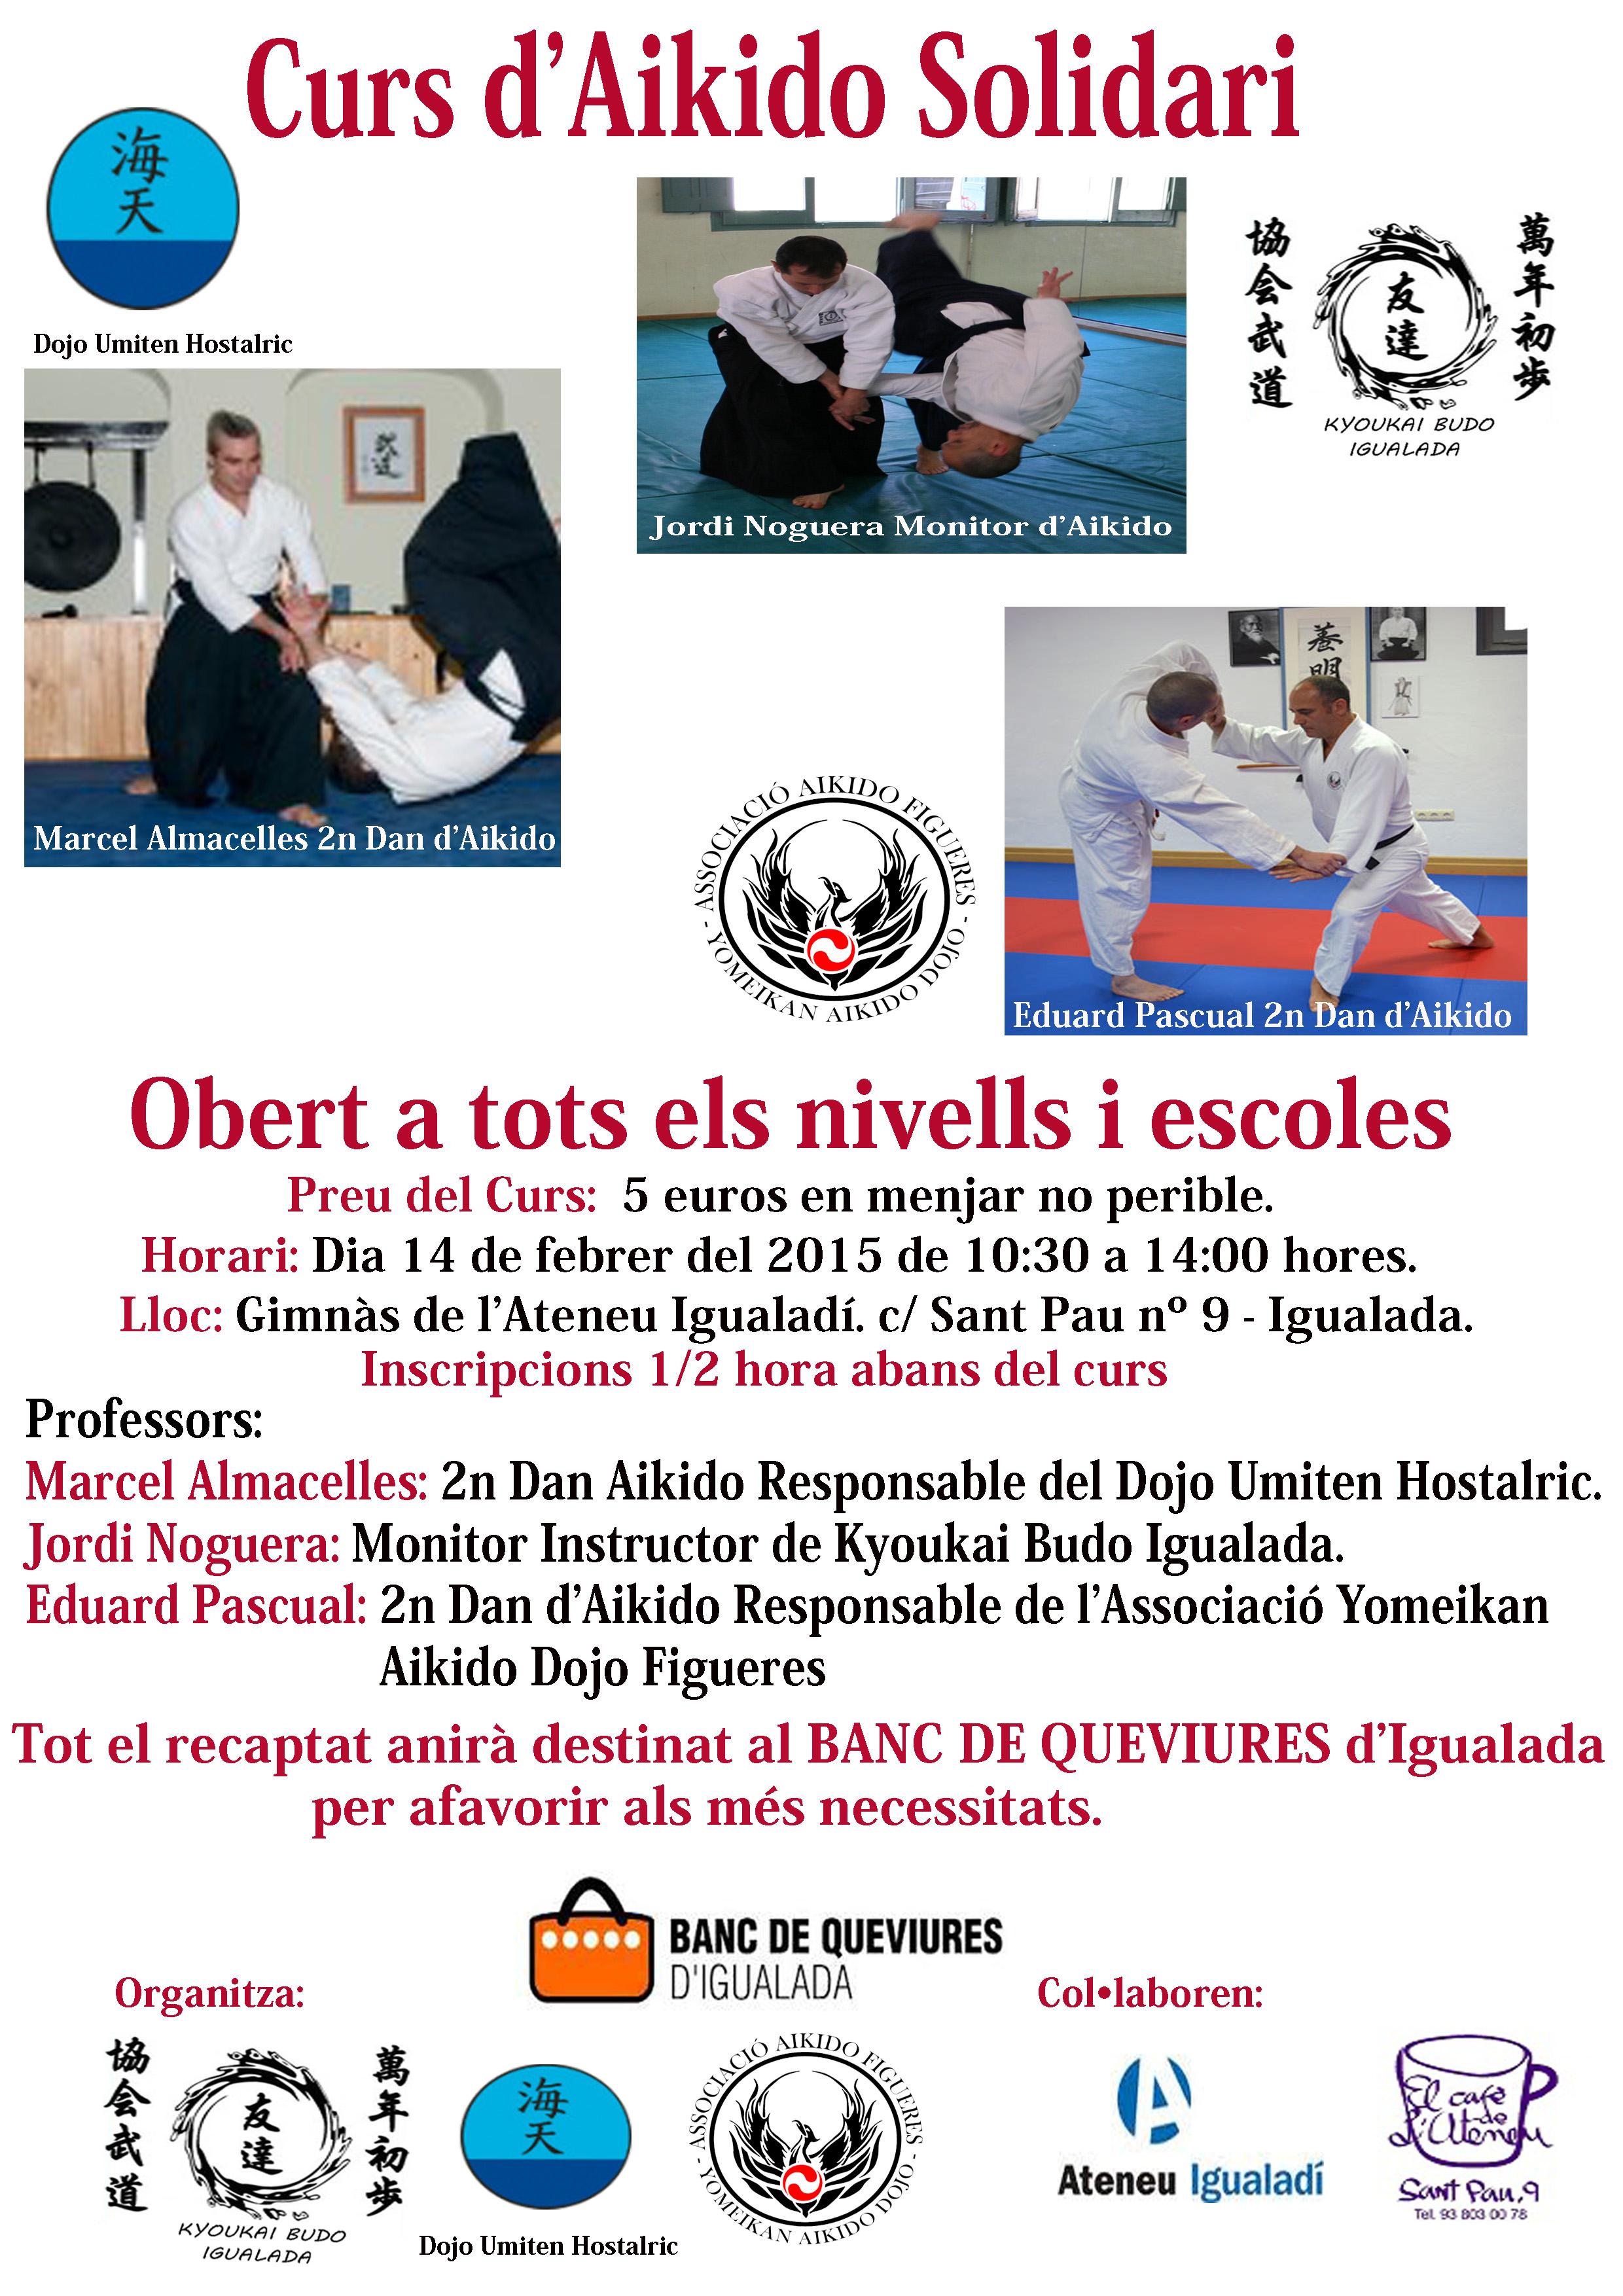 Curso AikidoInterclubs Febrero 2015.Ret. Pers. copia